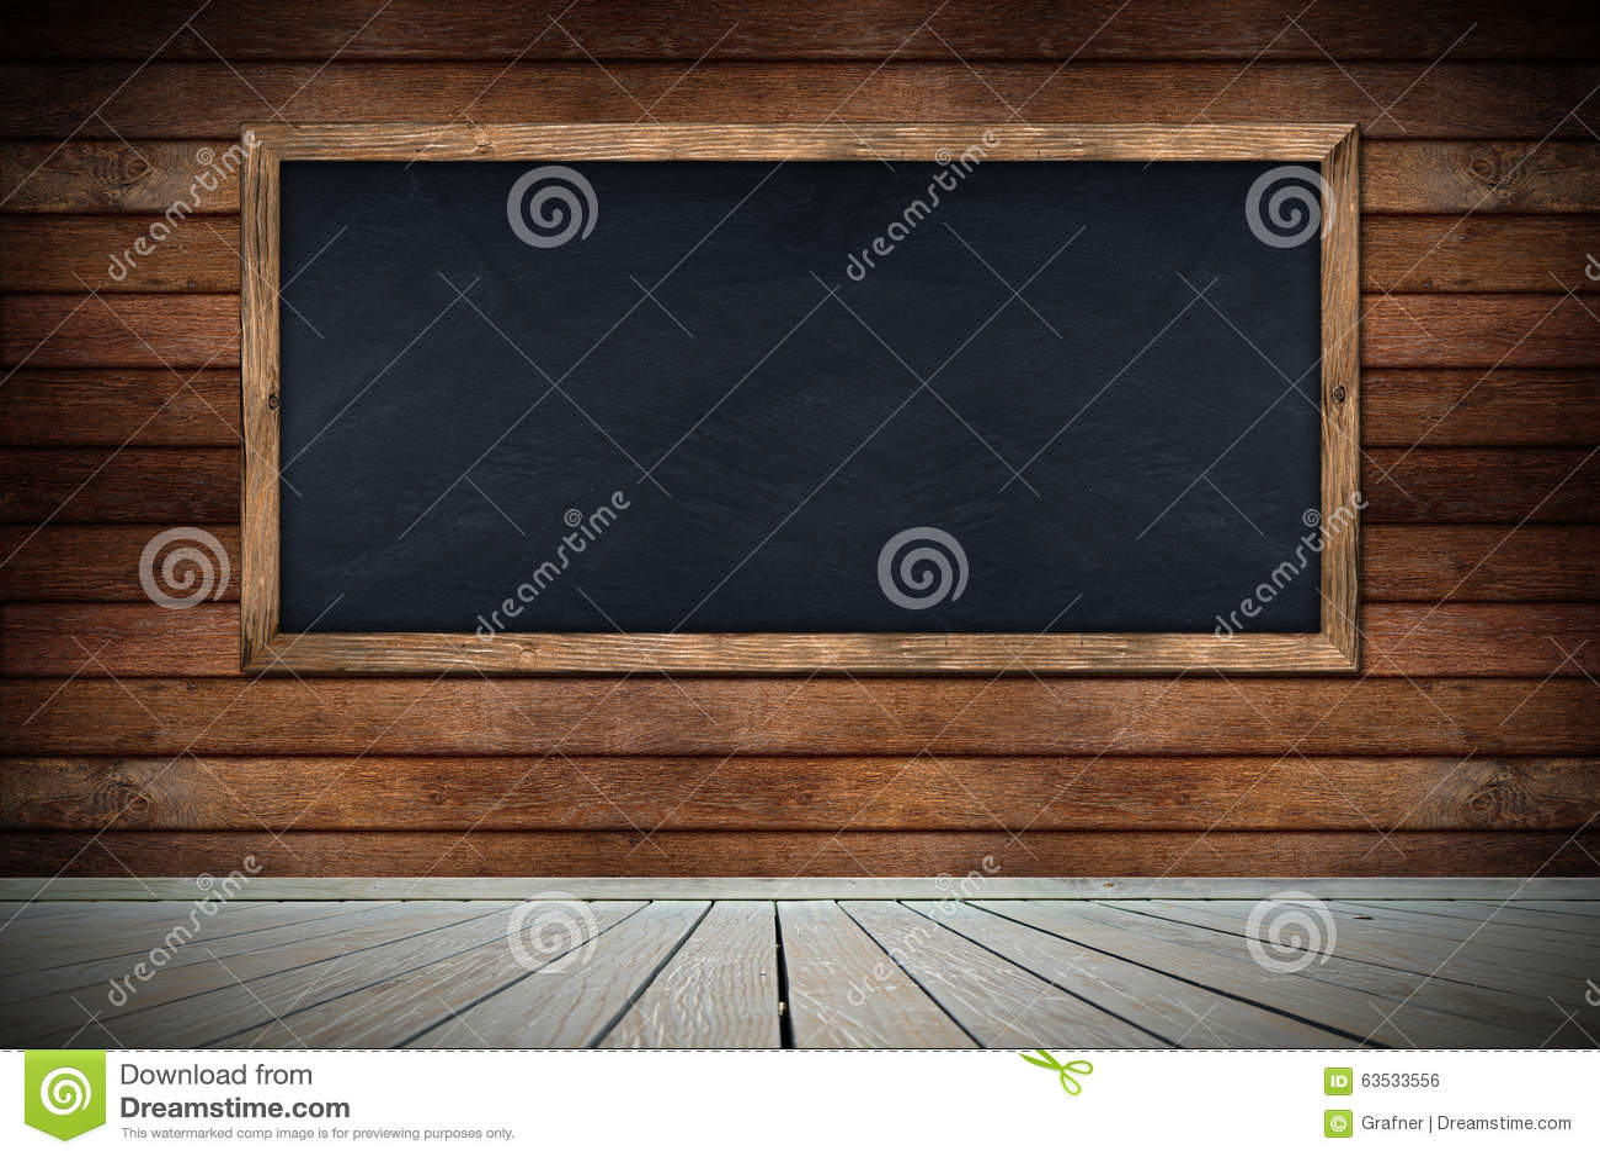 Blackboard Innovative Classroom ~ Blackboard classroom stock photo image